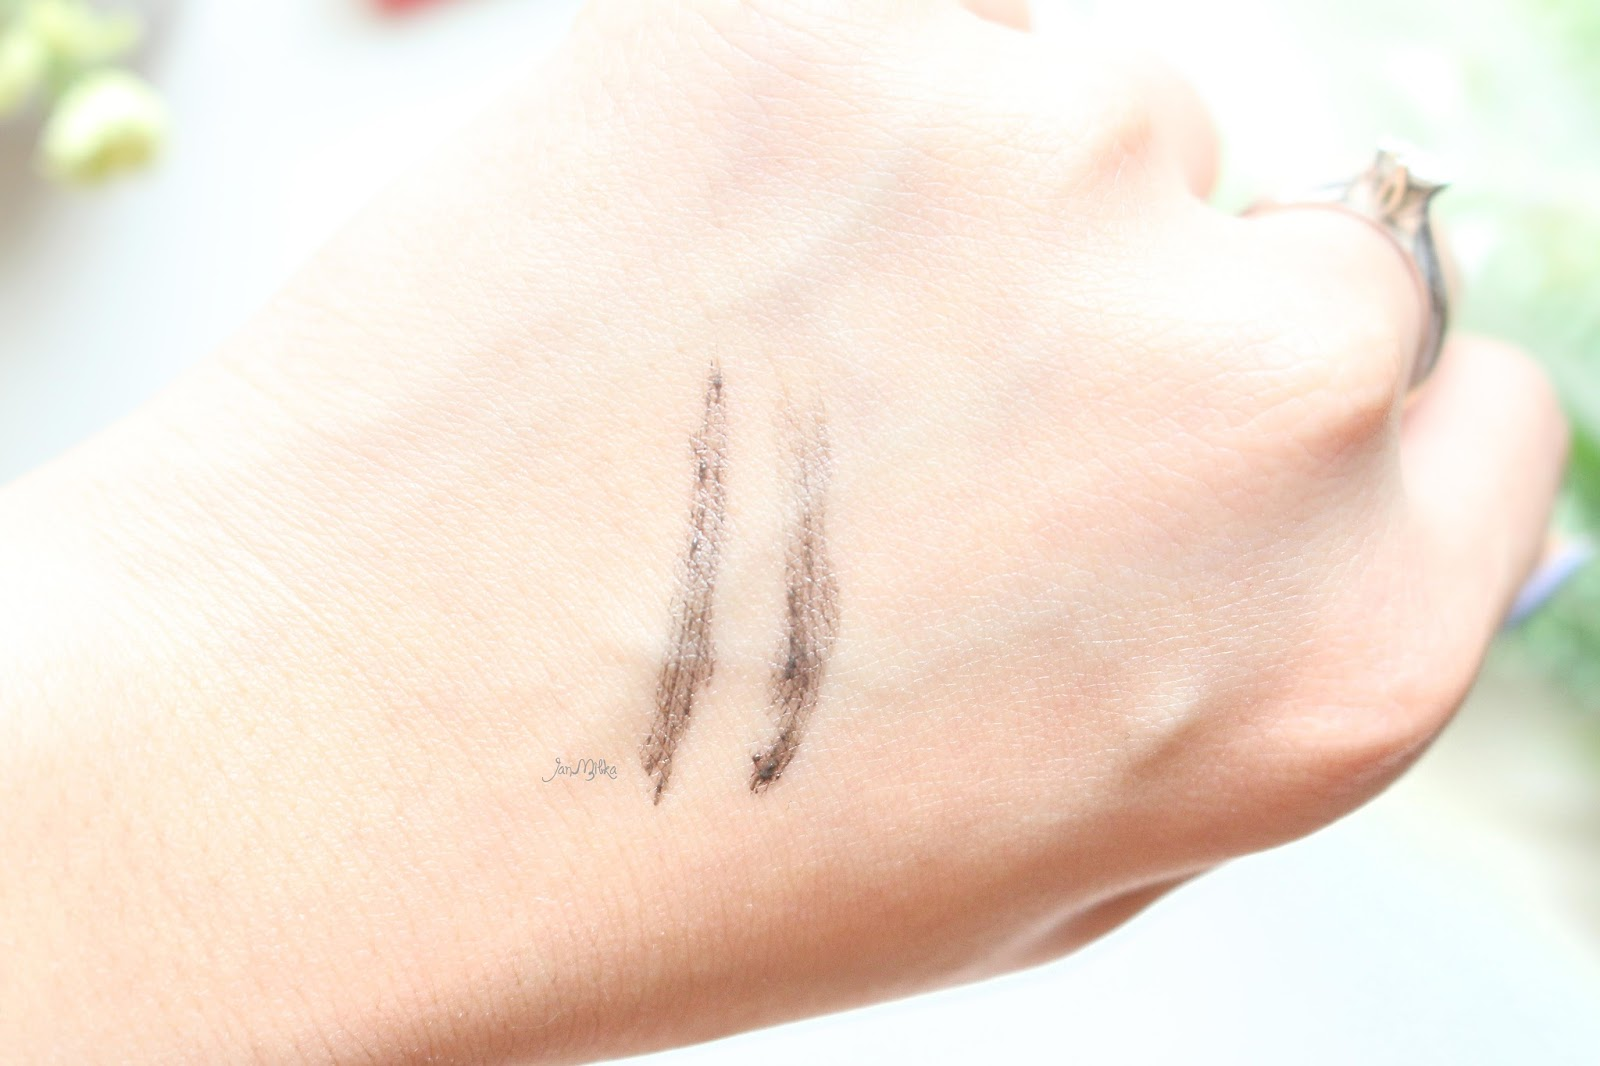 benefit, benefit cosmetics, gimme brow, brow, alis, luxola, luxola id, luxola indonesia, indonesia, review, swatch, beauty, blog, beauty blog